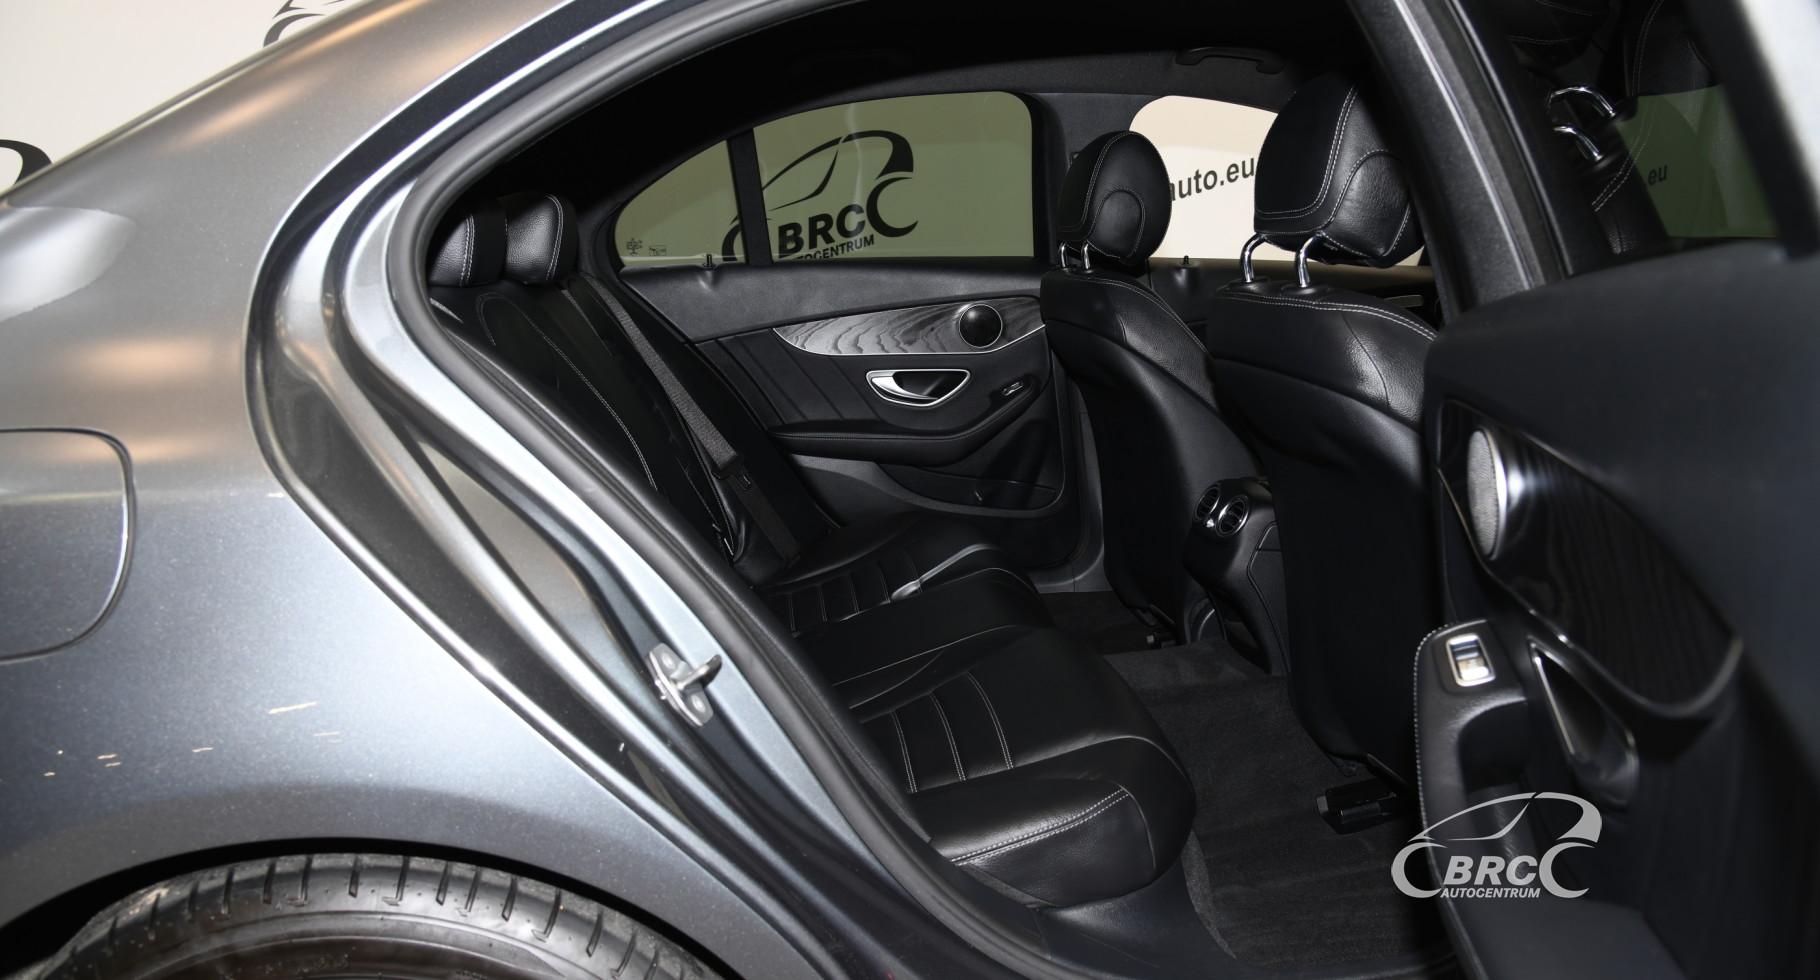 Mercedes-Benz C 220 CDI AMG Automatas